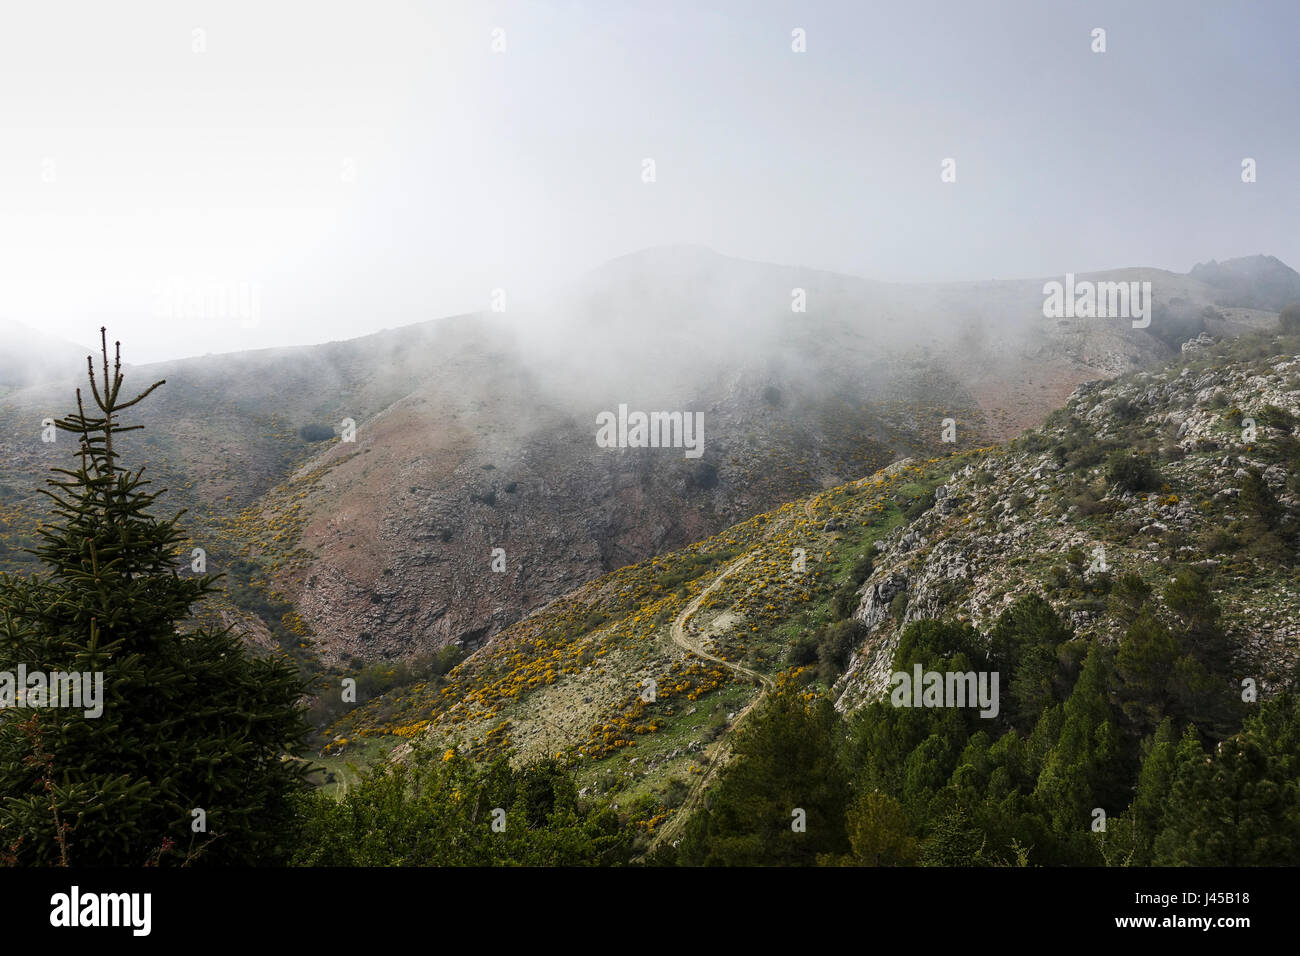 Scenic clouded mountain range at Valle del general, Serranía de Ronda, Malaga, Spain. - Stock Image